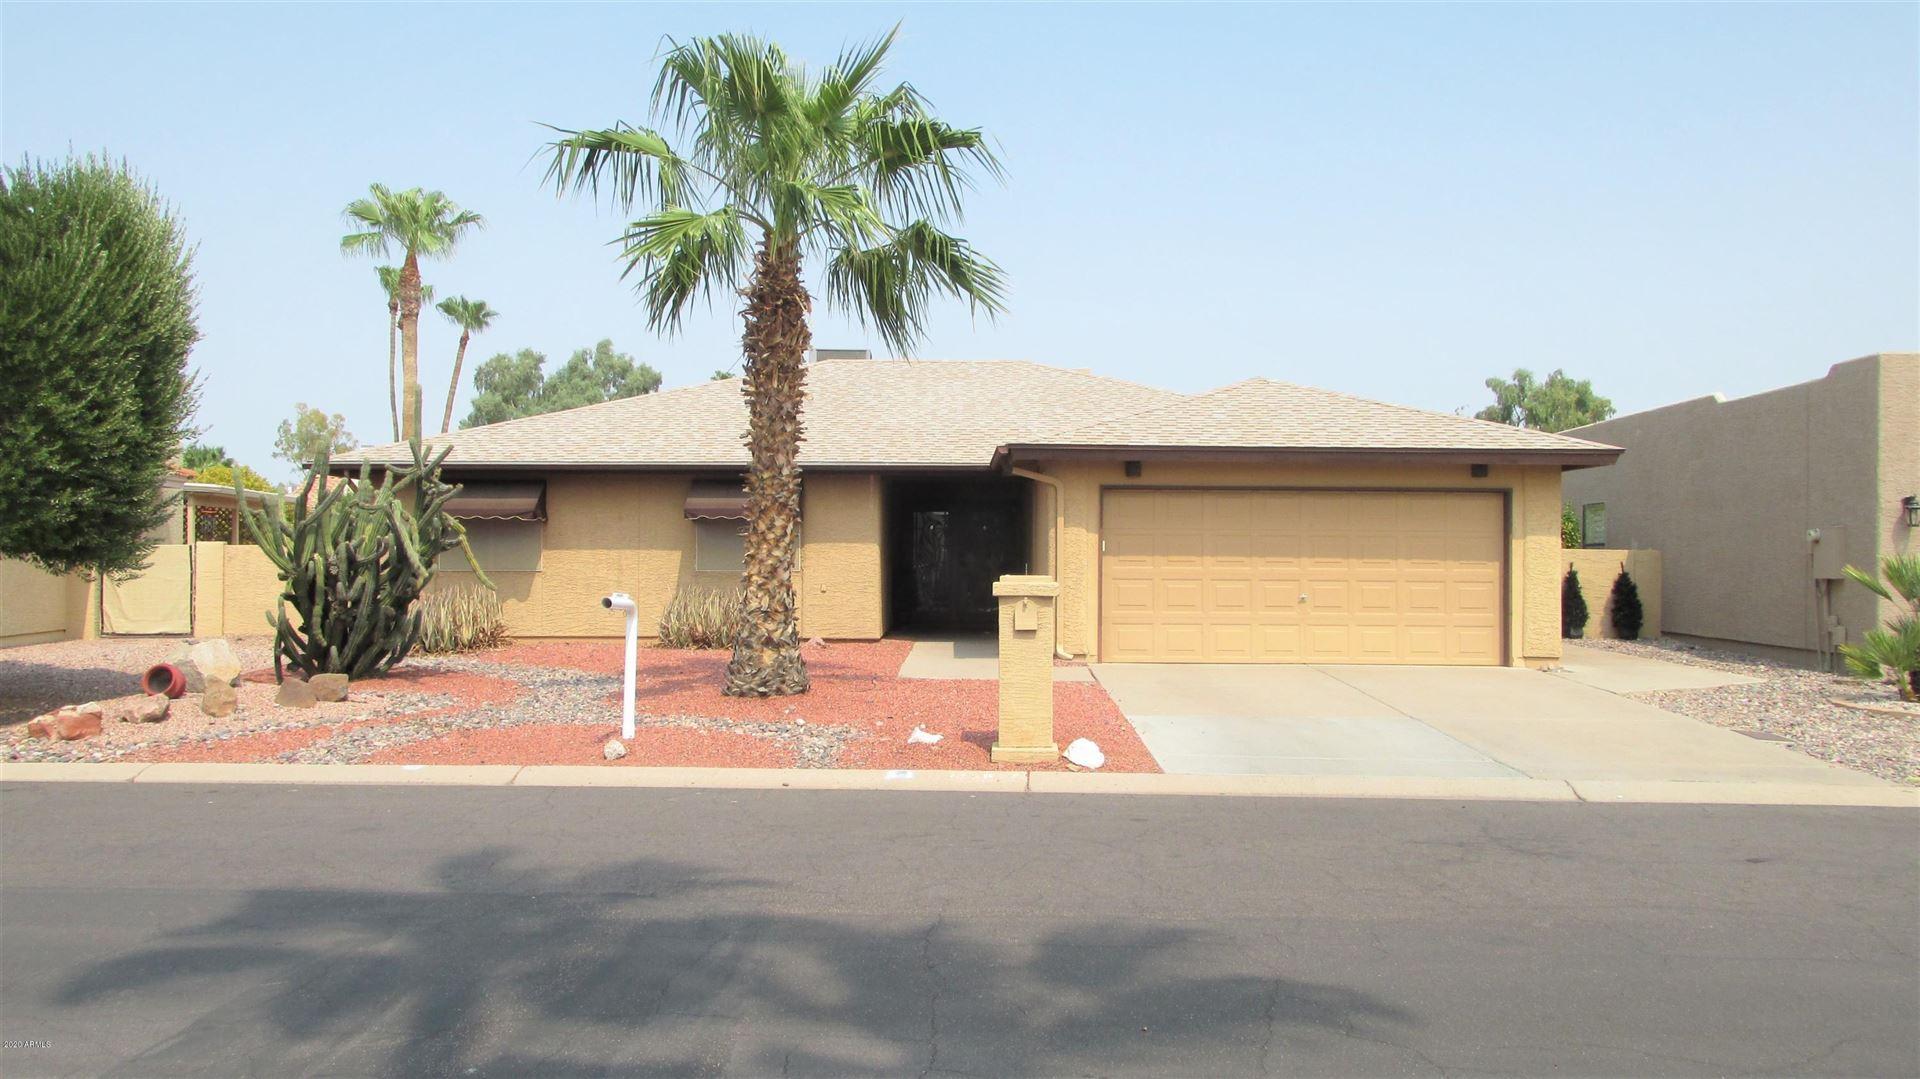 25817 S HOLLYGREEN Drive, Sun Lakes, AZ 85248 - MLS#: 6124679